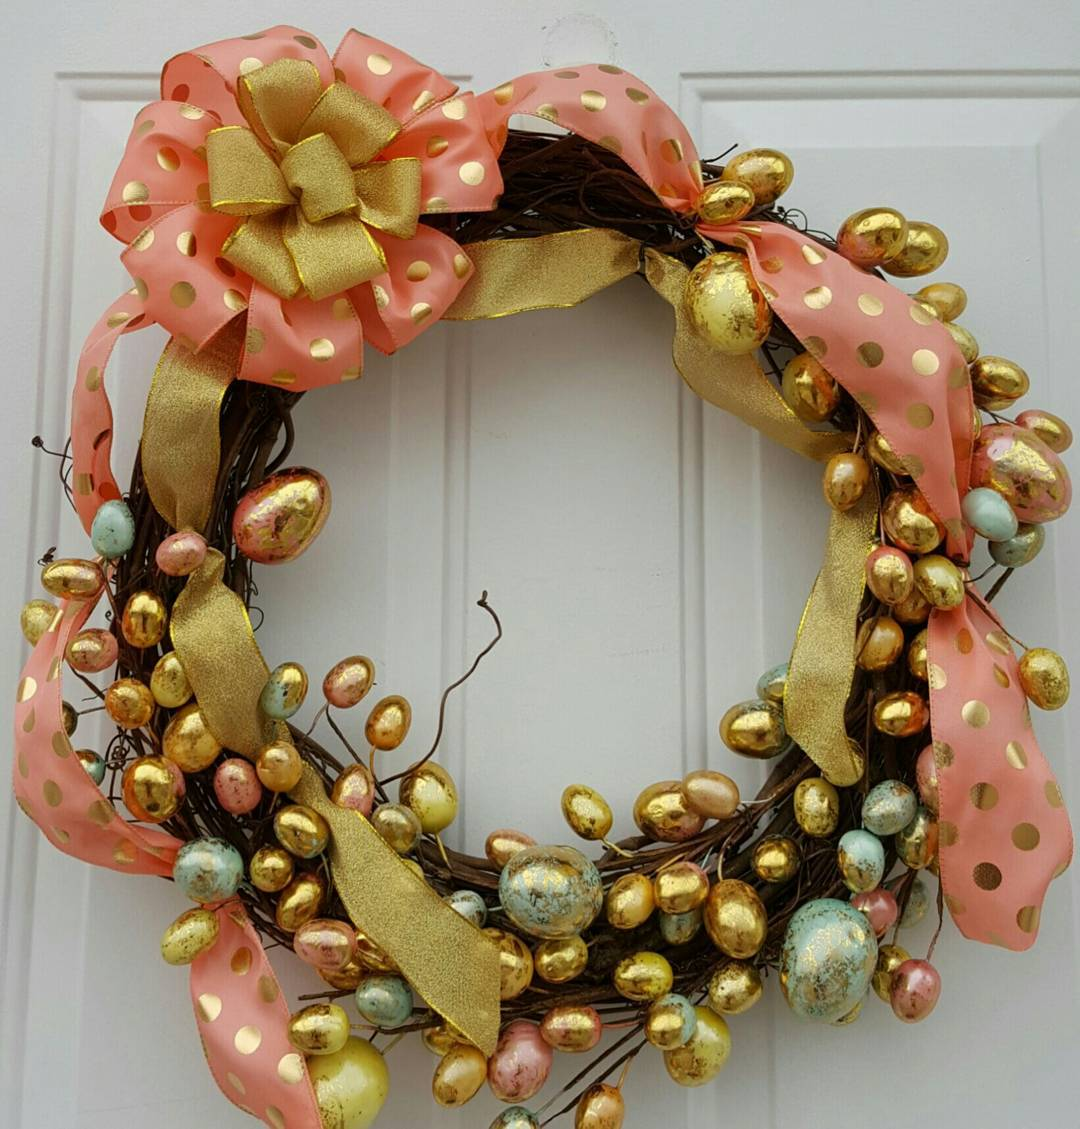 Vibrant Golden Sparkling Wreath For Easter Celebration